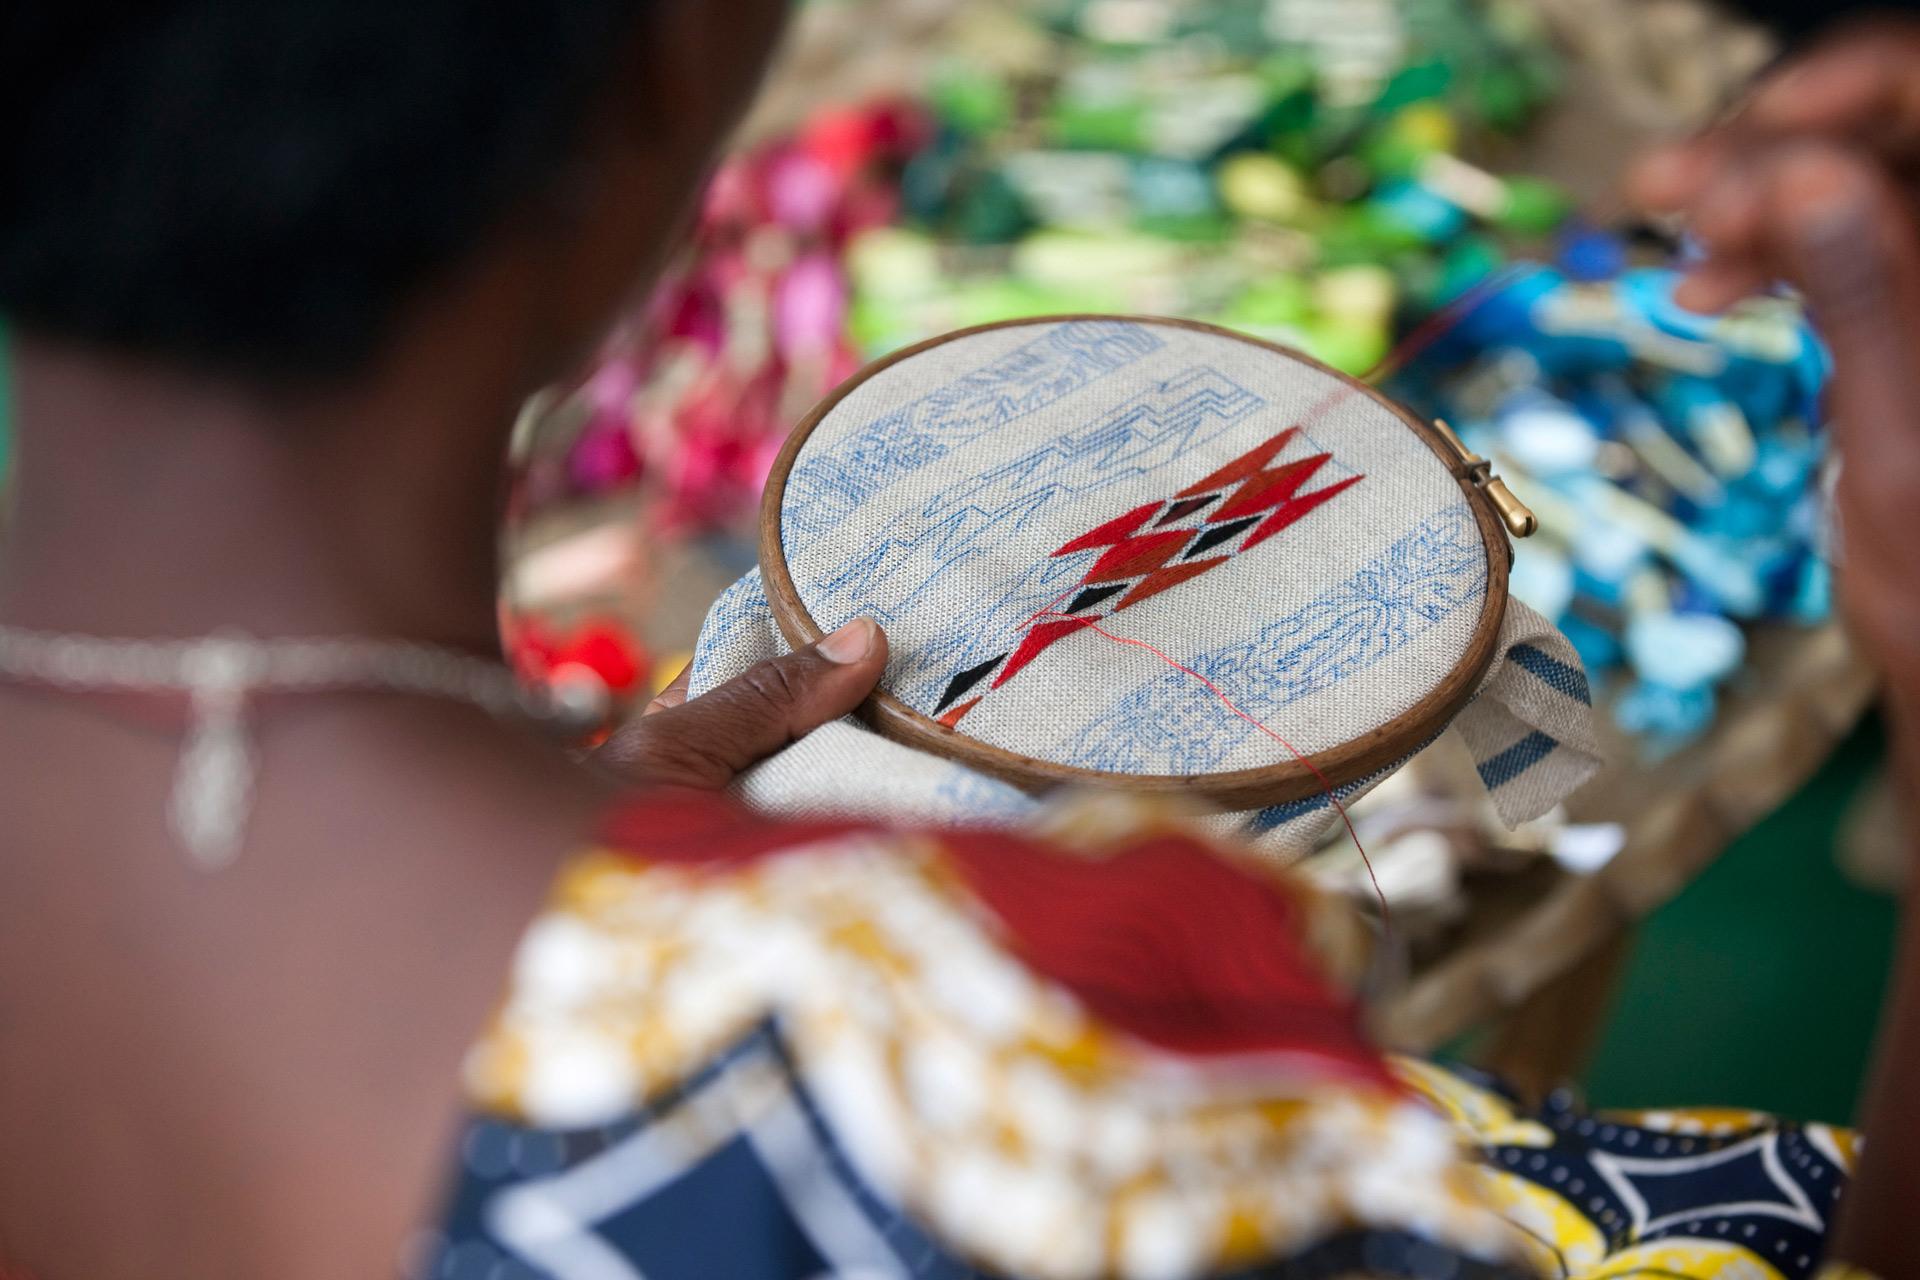 Brodeuse - embroiderer Ibaba Rwanda